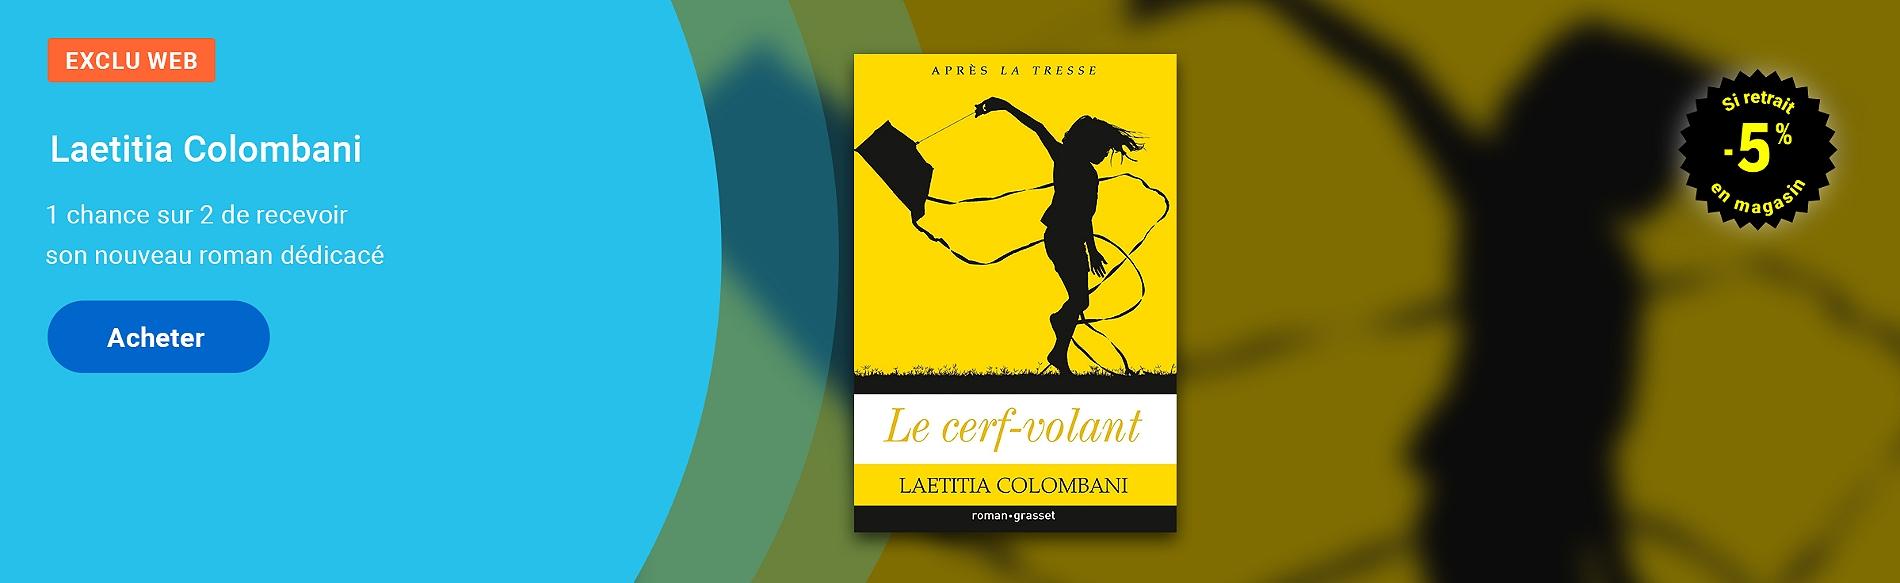 Laetitia Colombani - Le cerf-volant